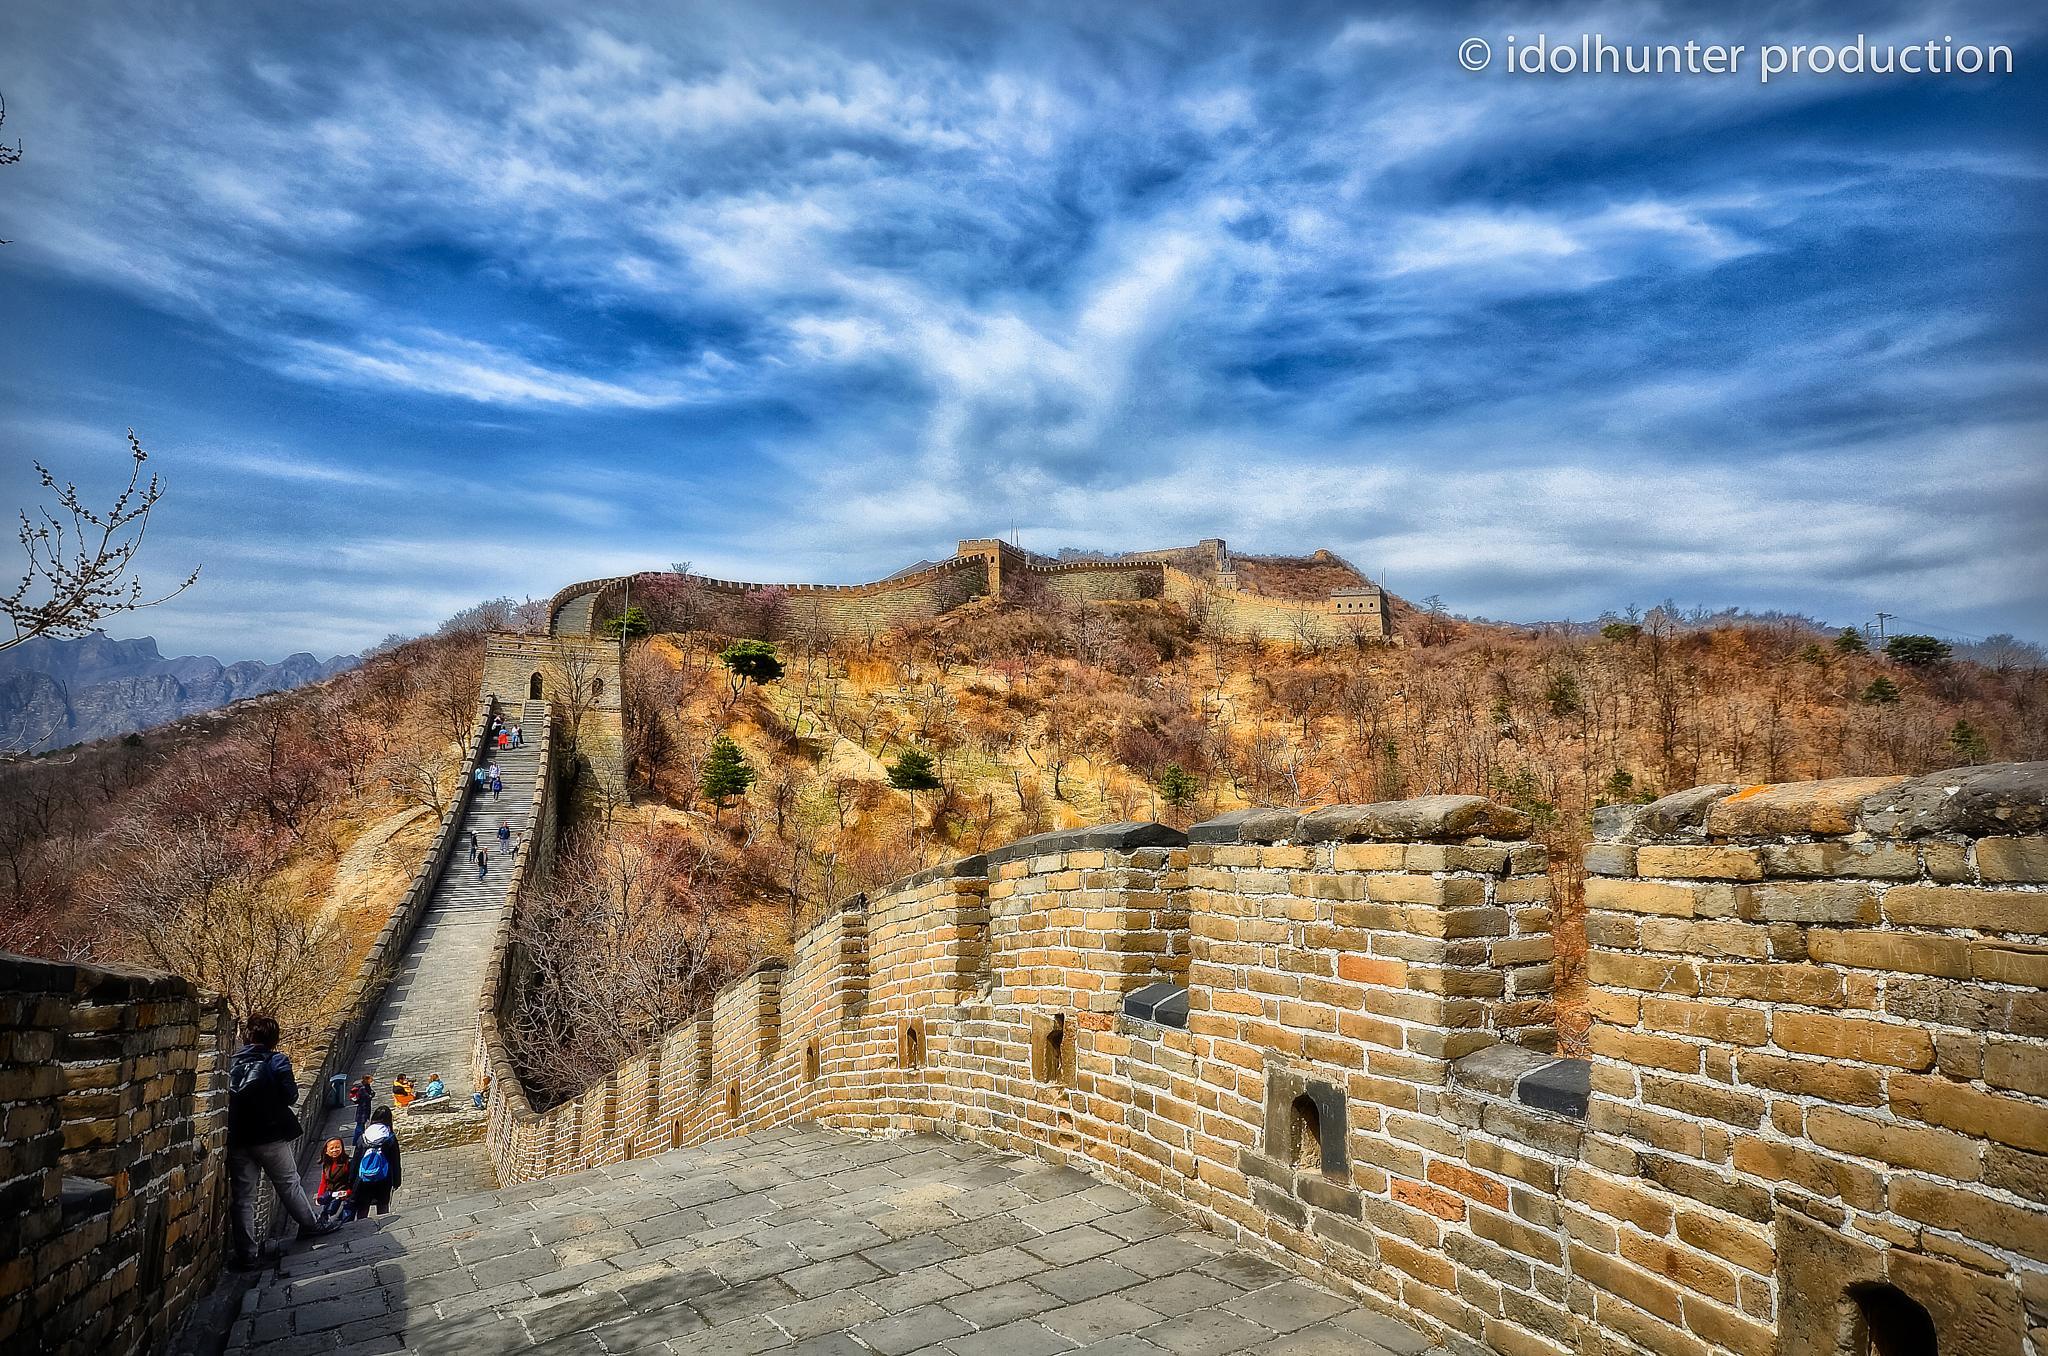 Great Wall of China by idolhunter